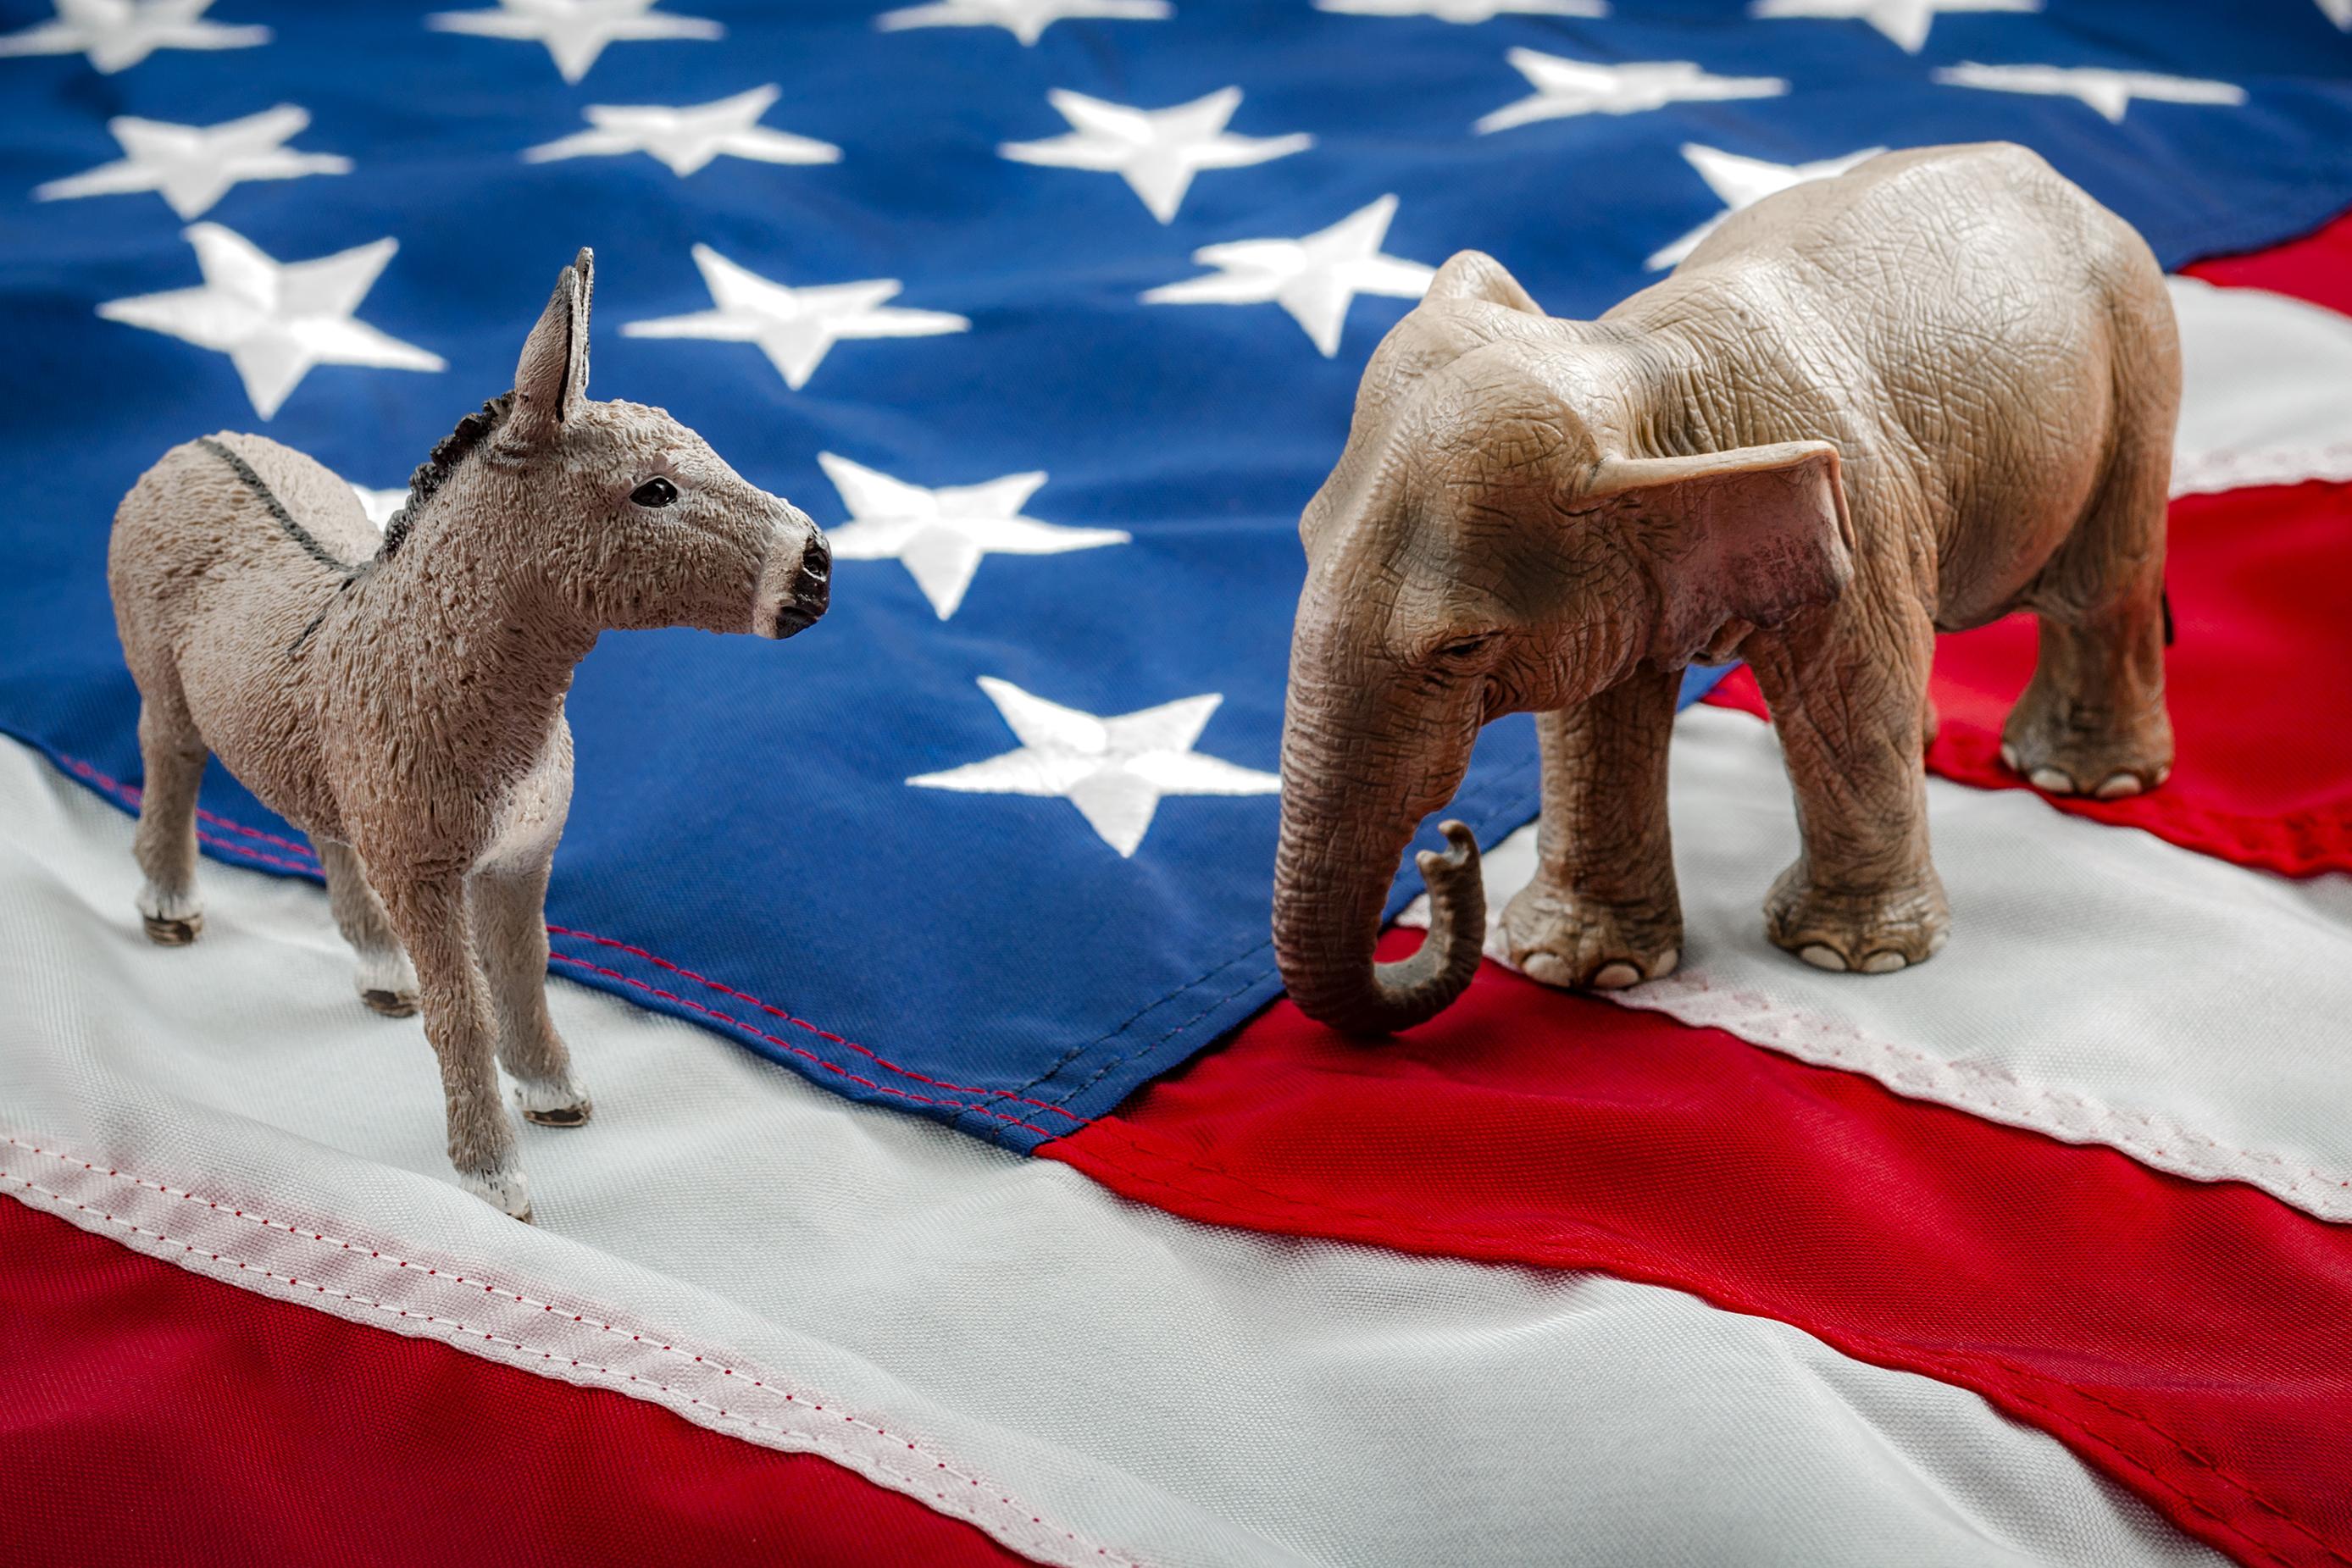 A donkey and elephant standing on a U.S. flag.